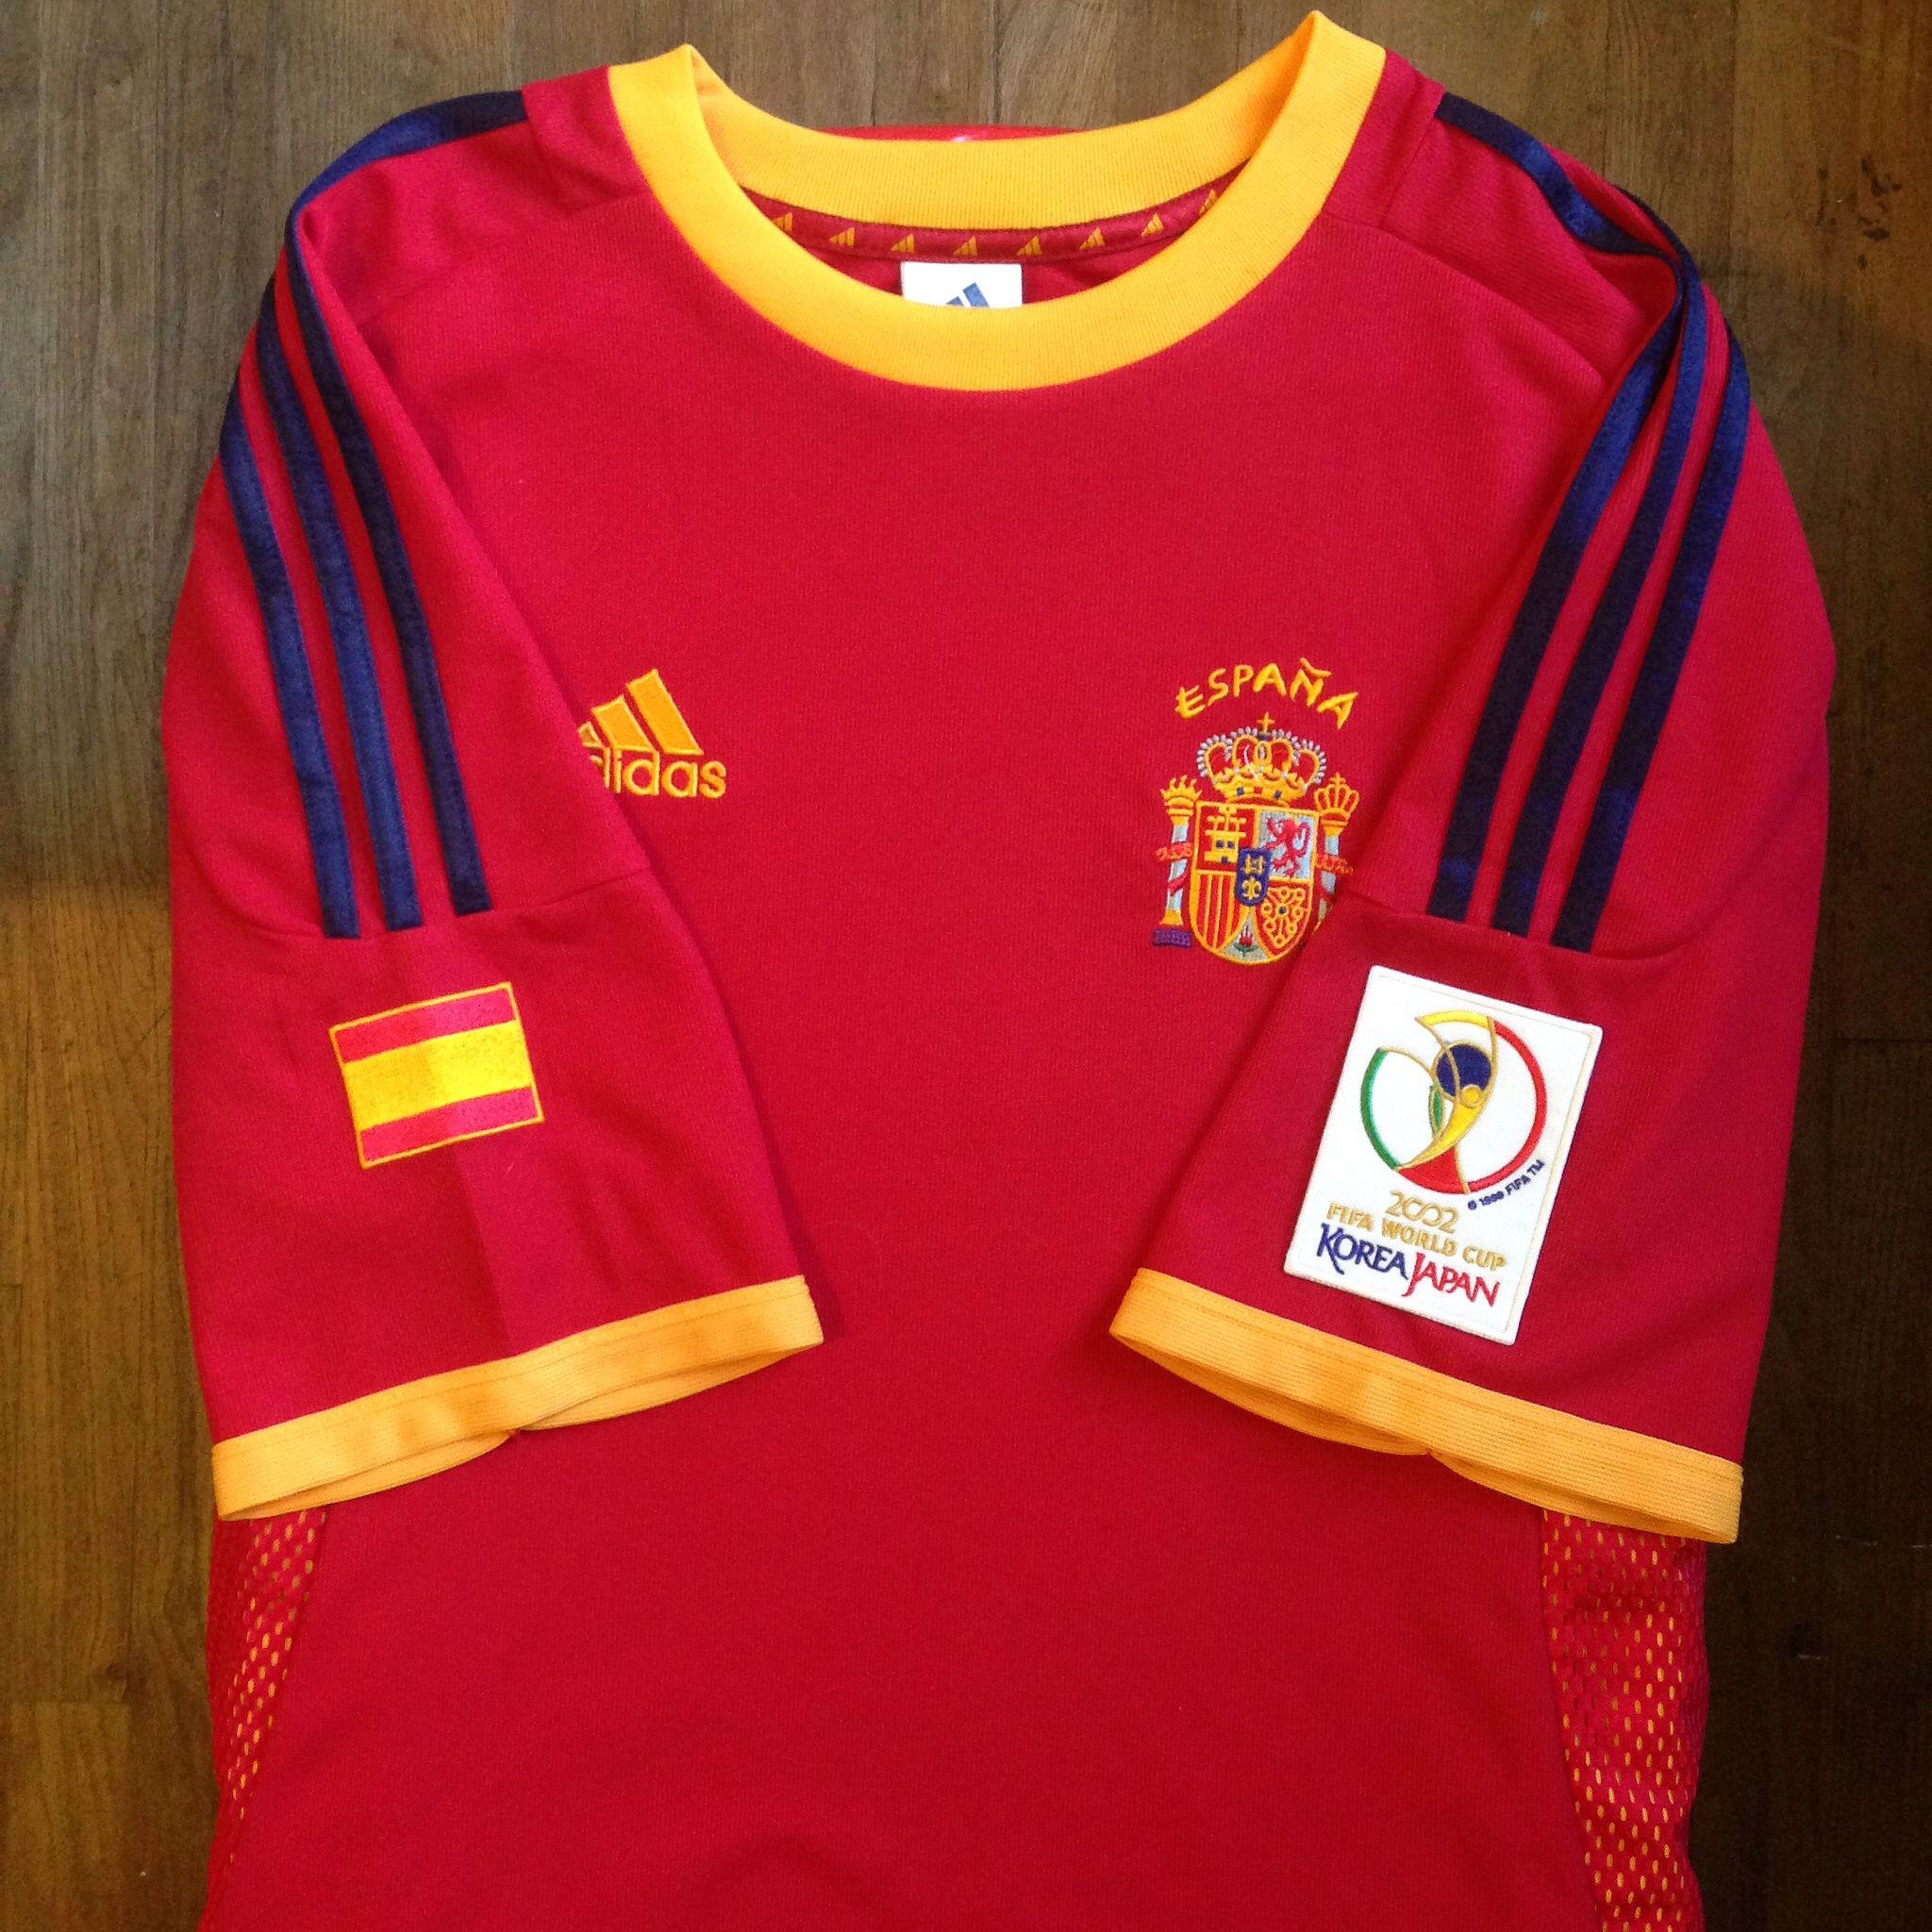 2002 Korea Japan Fifa World Cup Spain Home Jersey In 2020 Fifa Fifa World Cup World Cup